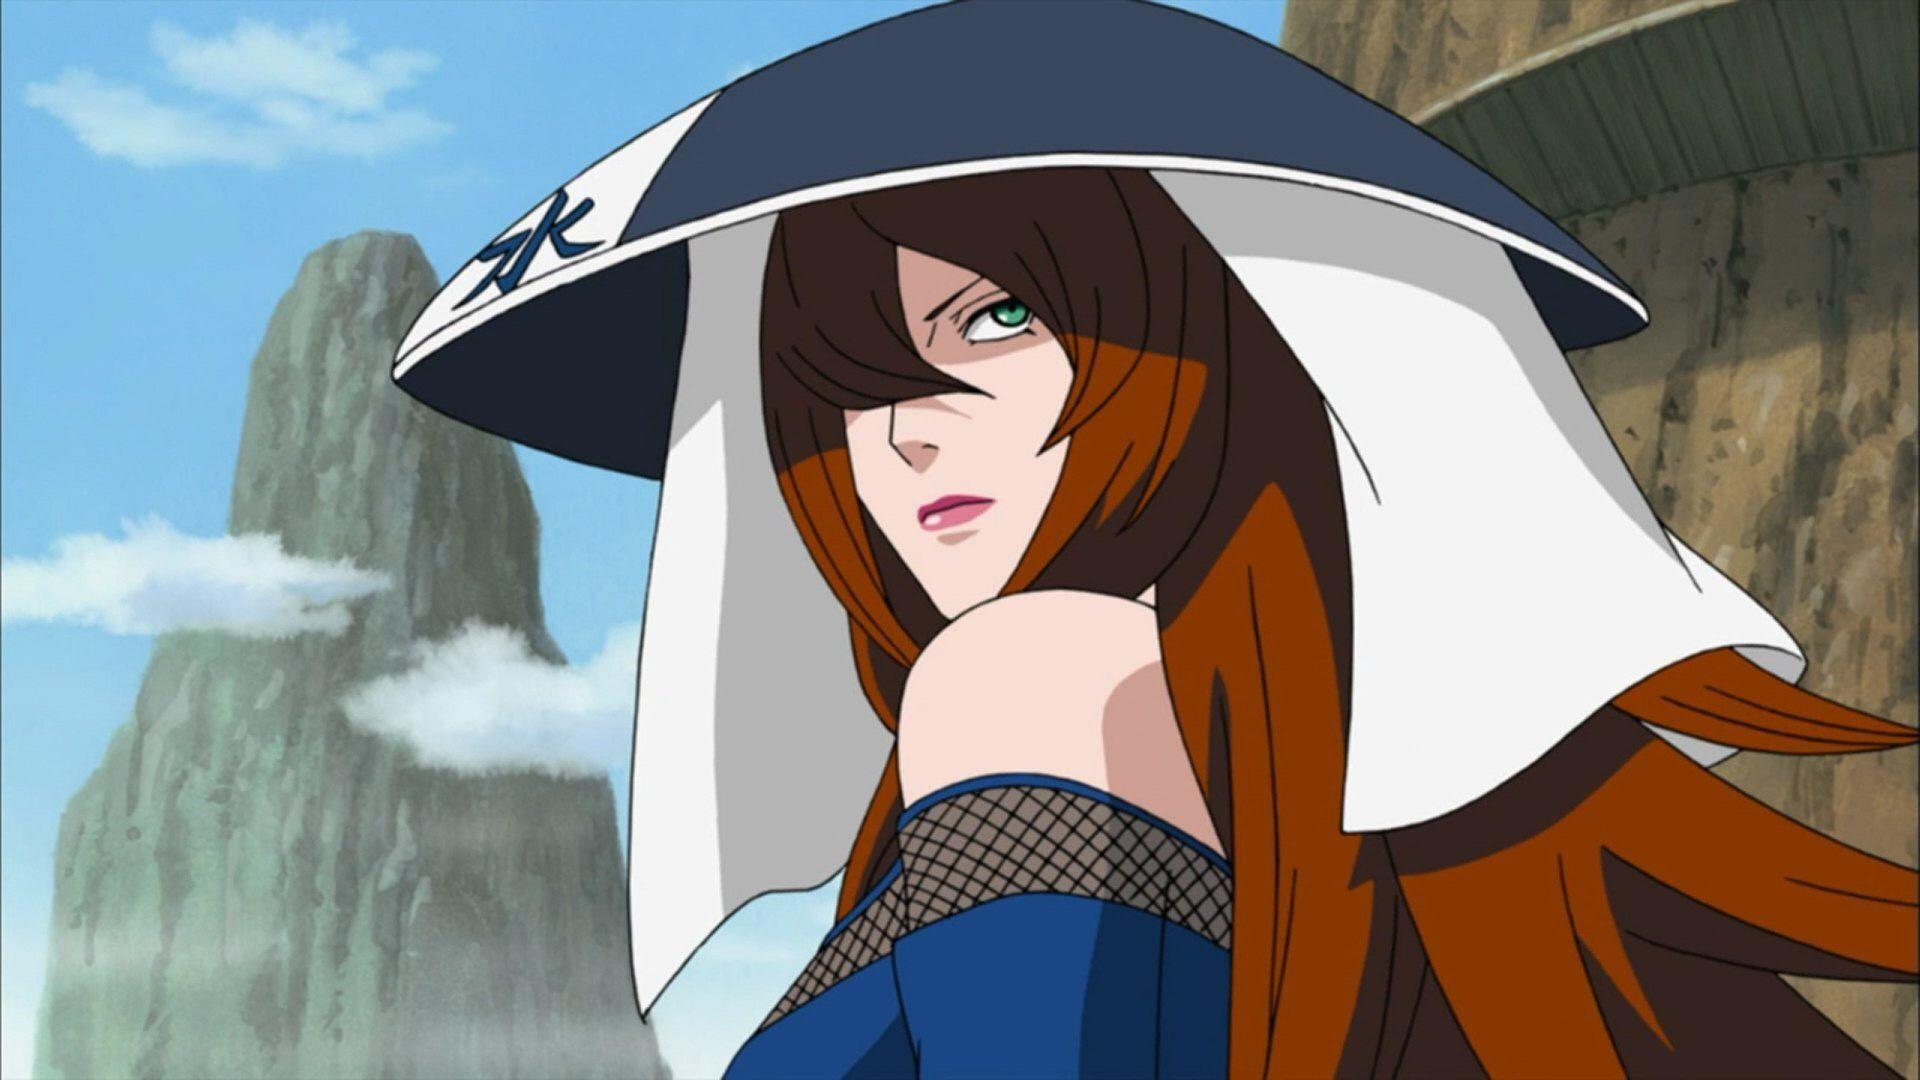 10 Karakter Shinobi Wanita Terkuat di Anime Naruto 10